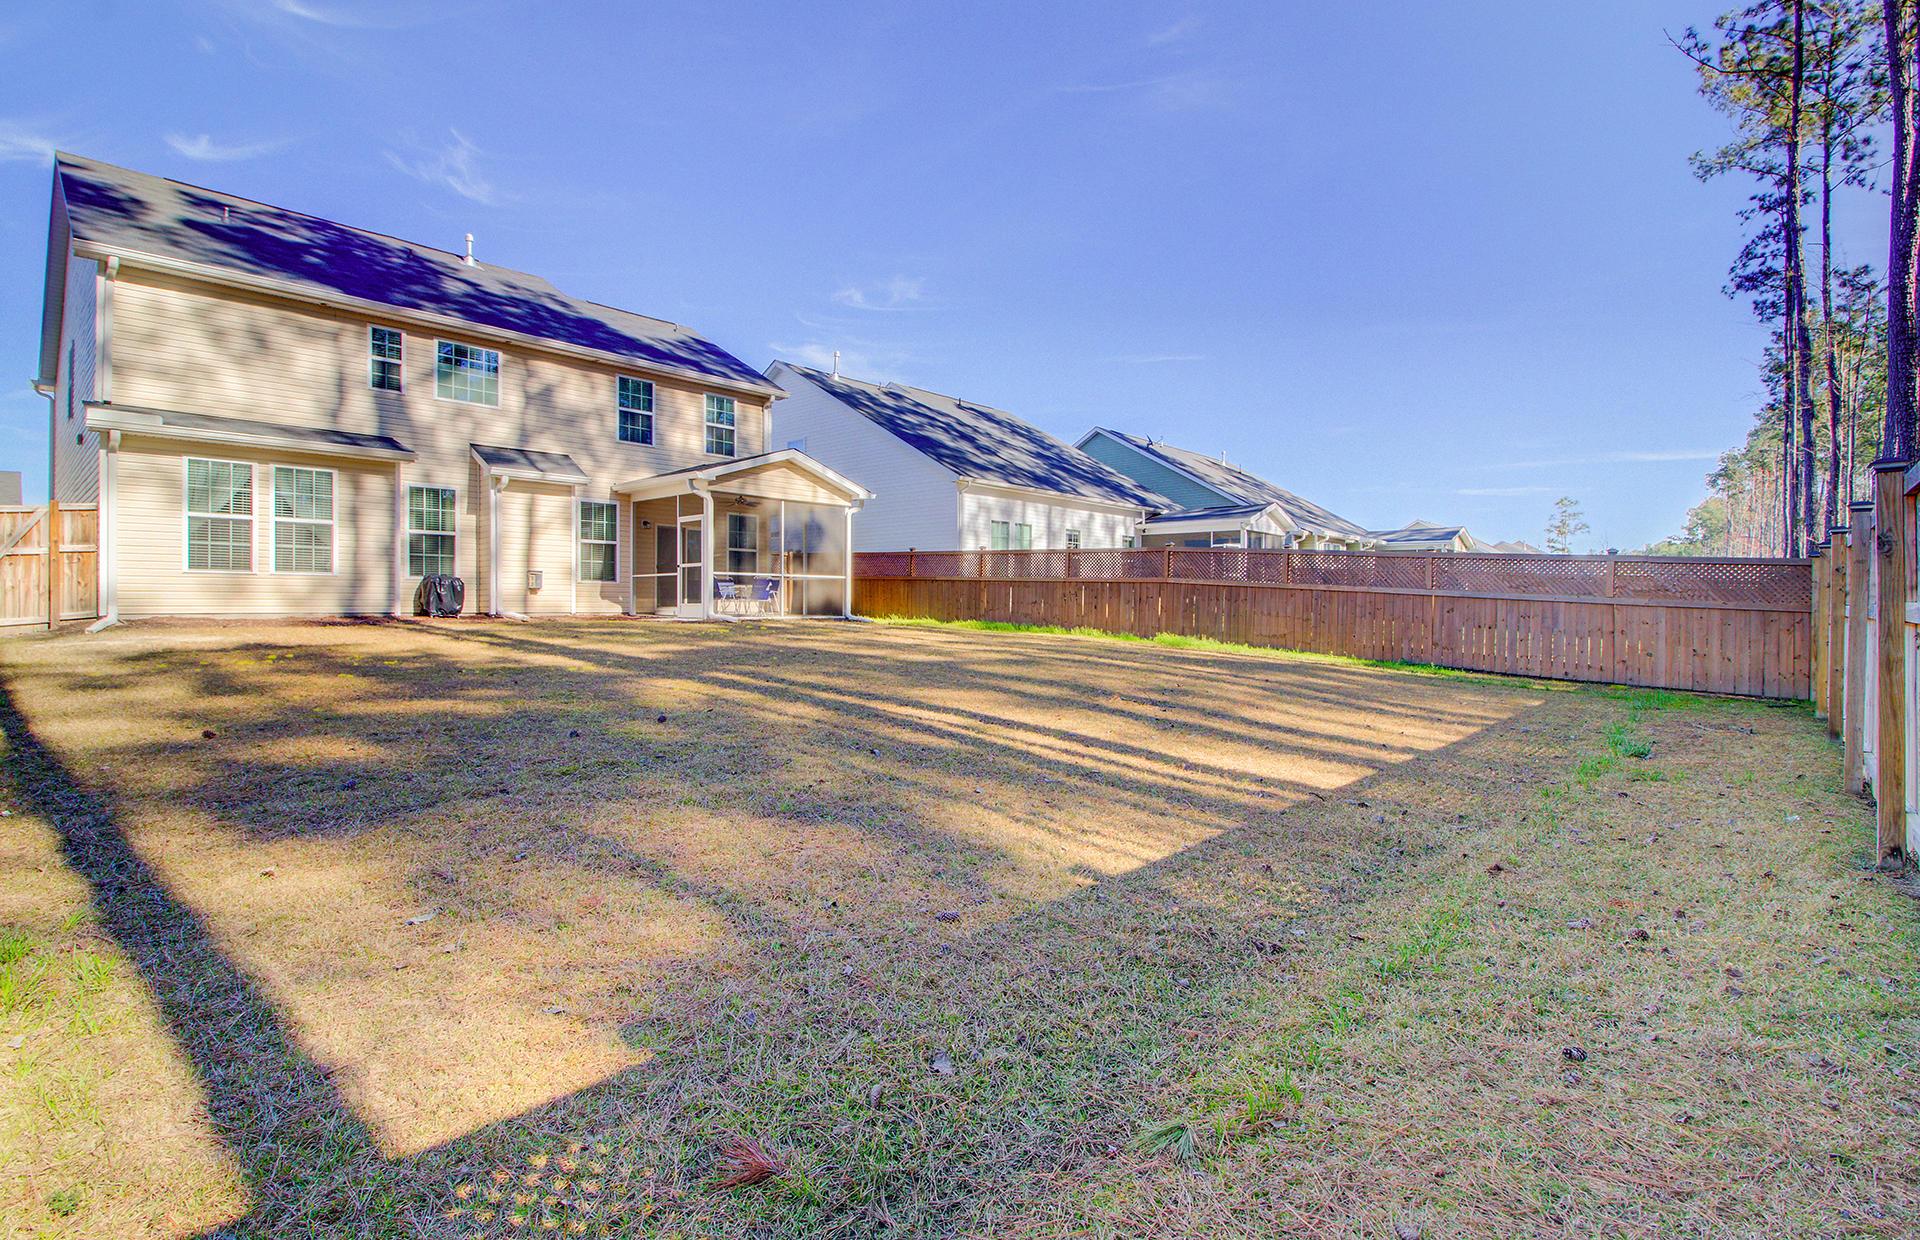 Cane Bay Plantation Homes For Sale - 255 Spectrum, Summerville, SC - 30